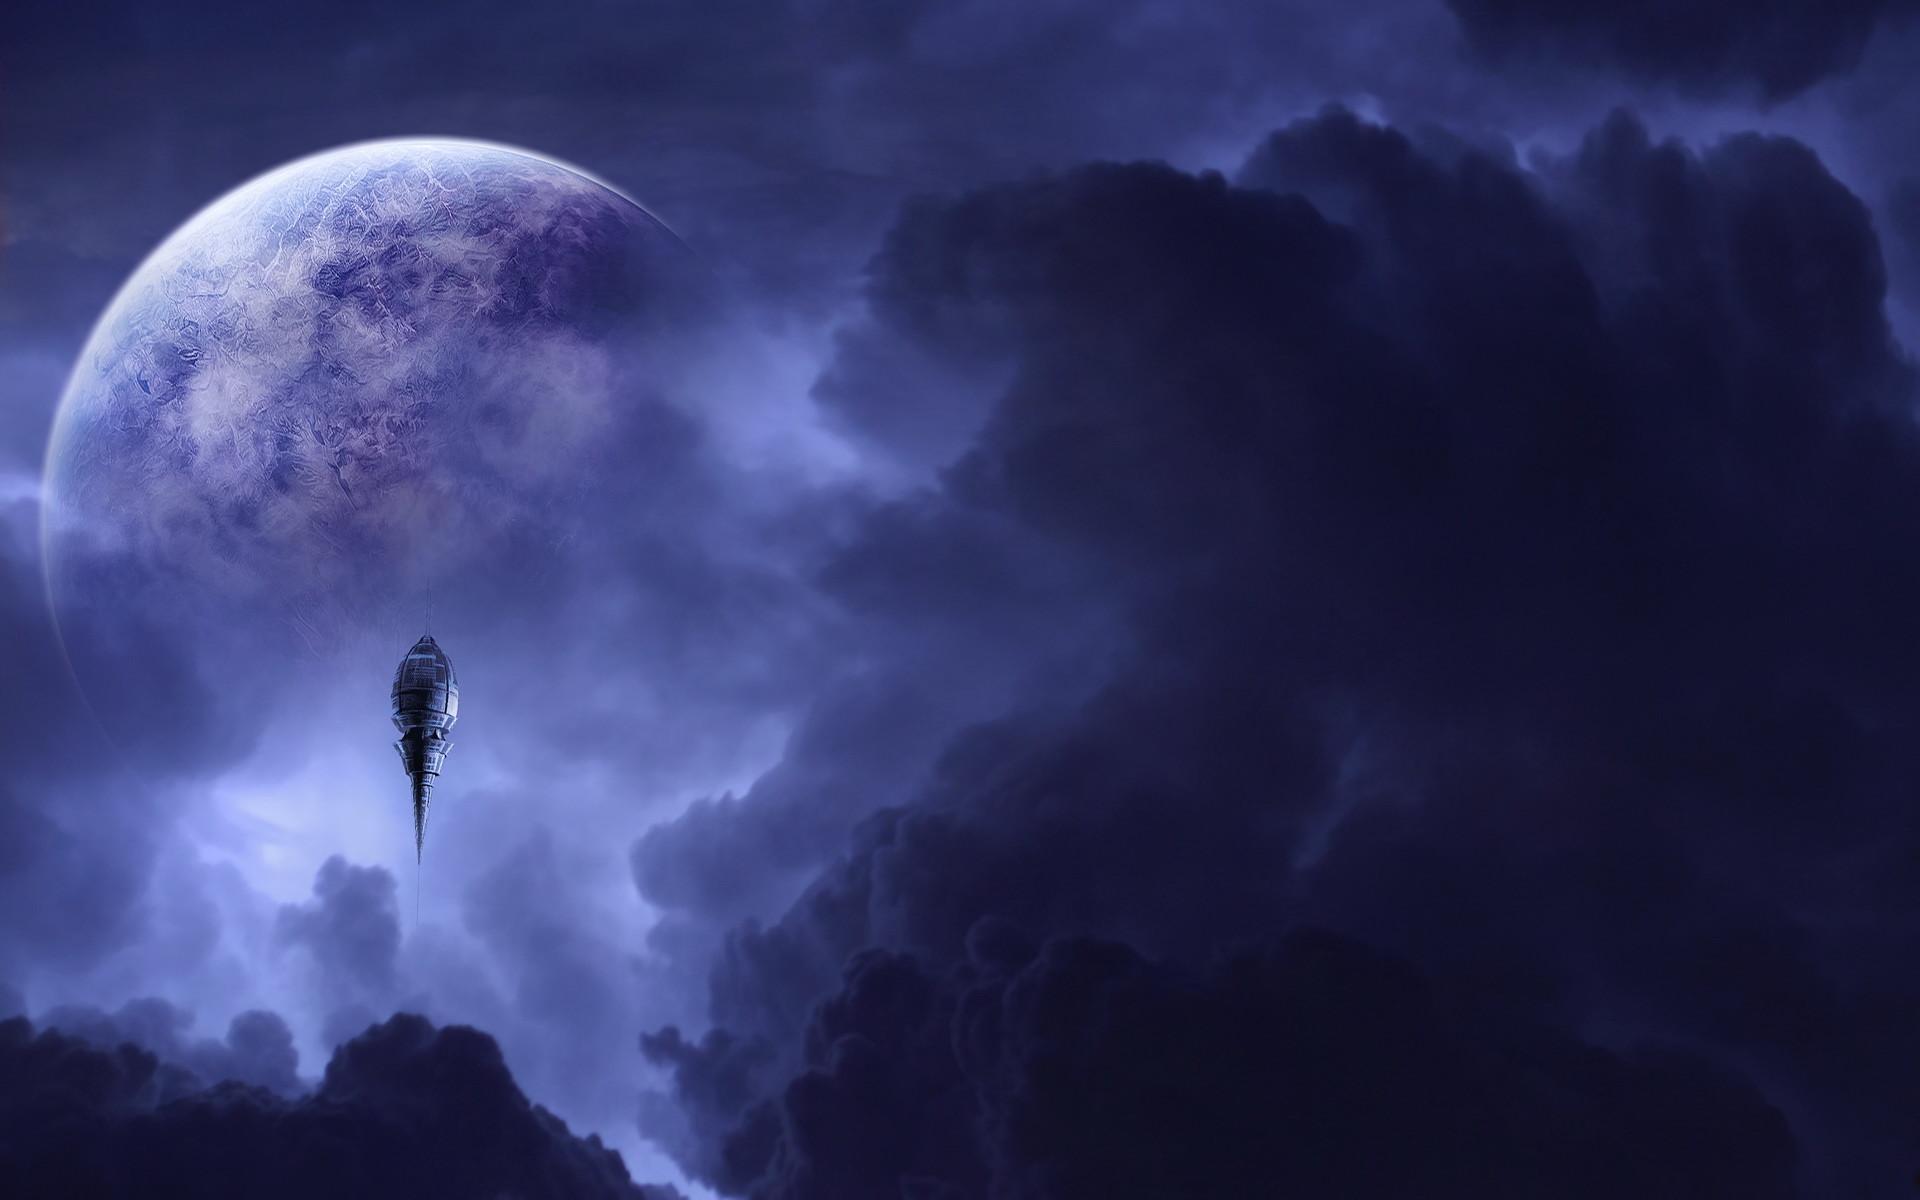 desktop fantasy pictures of the moon download